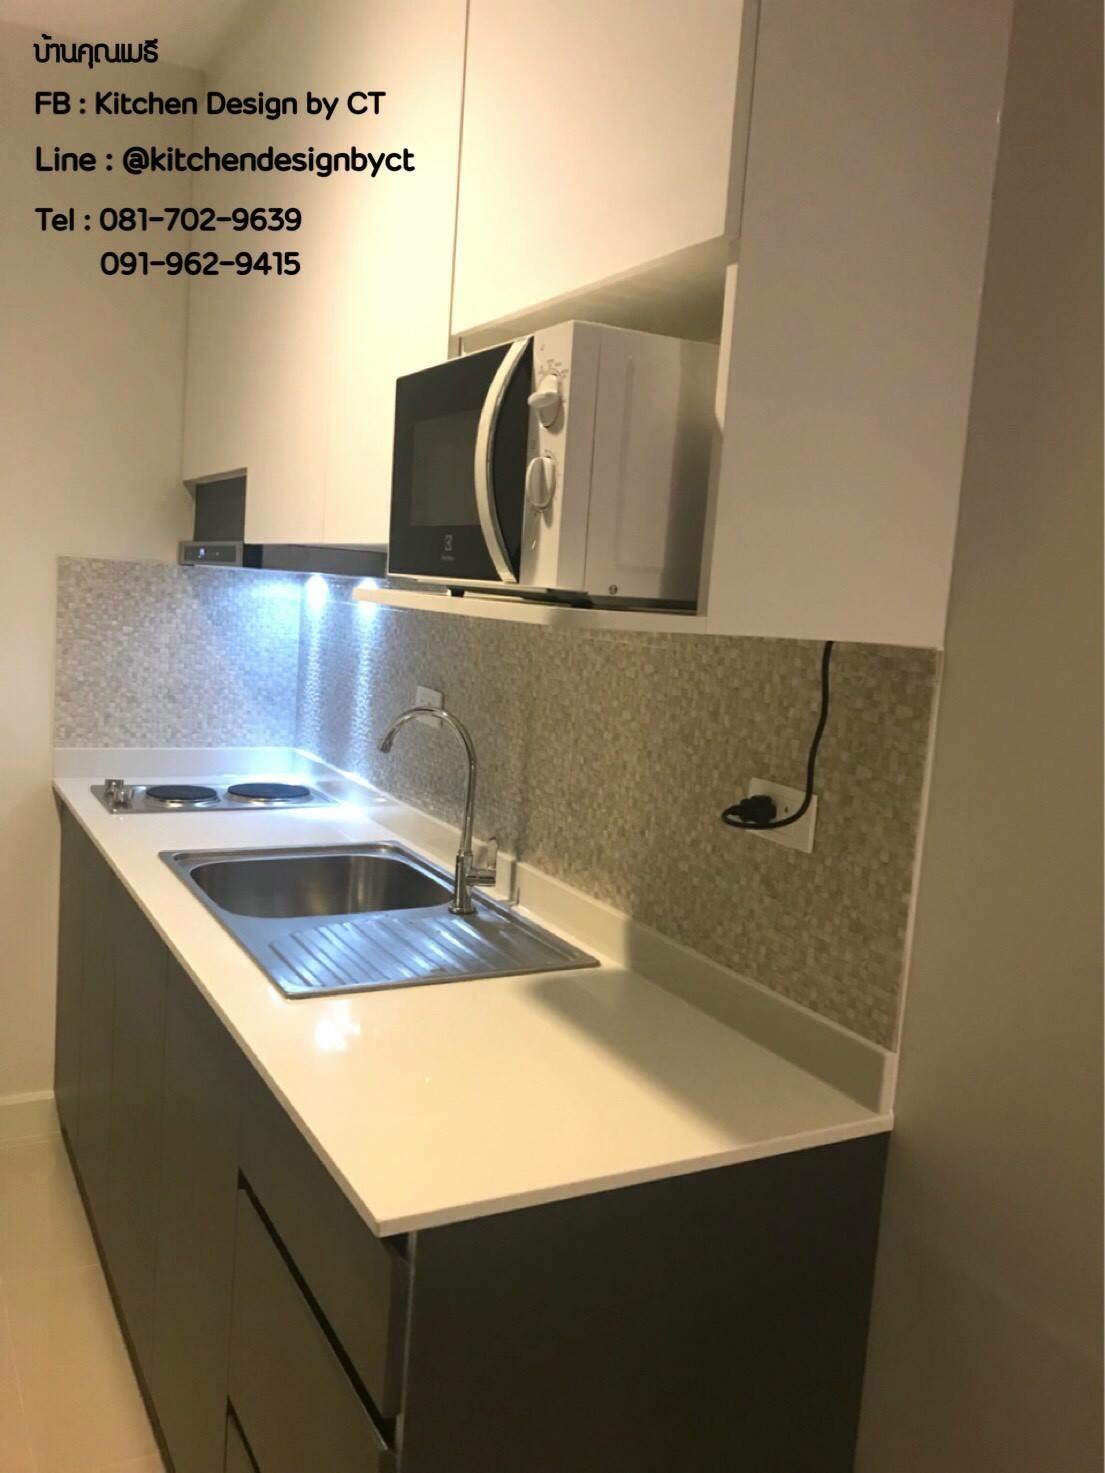 Two-Tone Modern Kitchen (ครัวบิวท์อินสีขาว-เทาสไตล์โมเดิร์น)